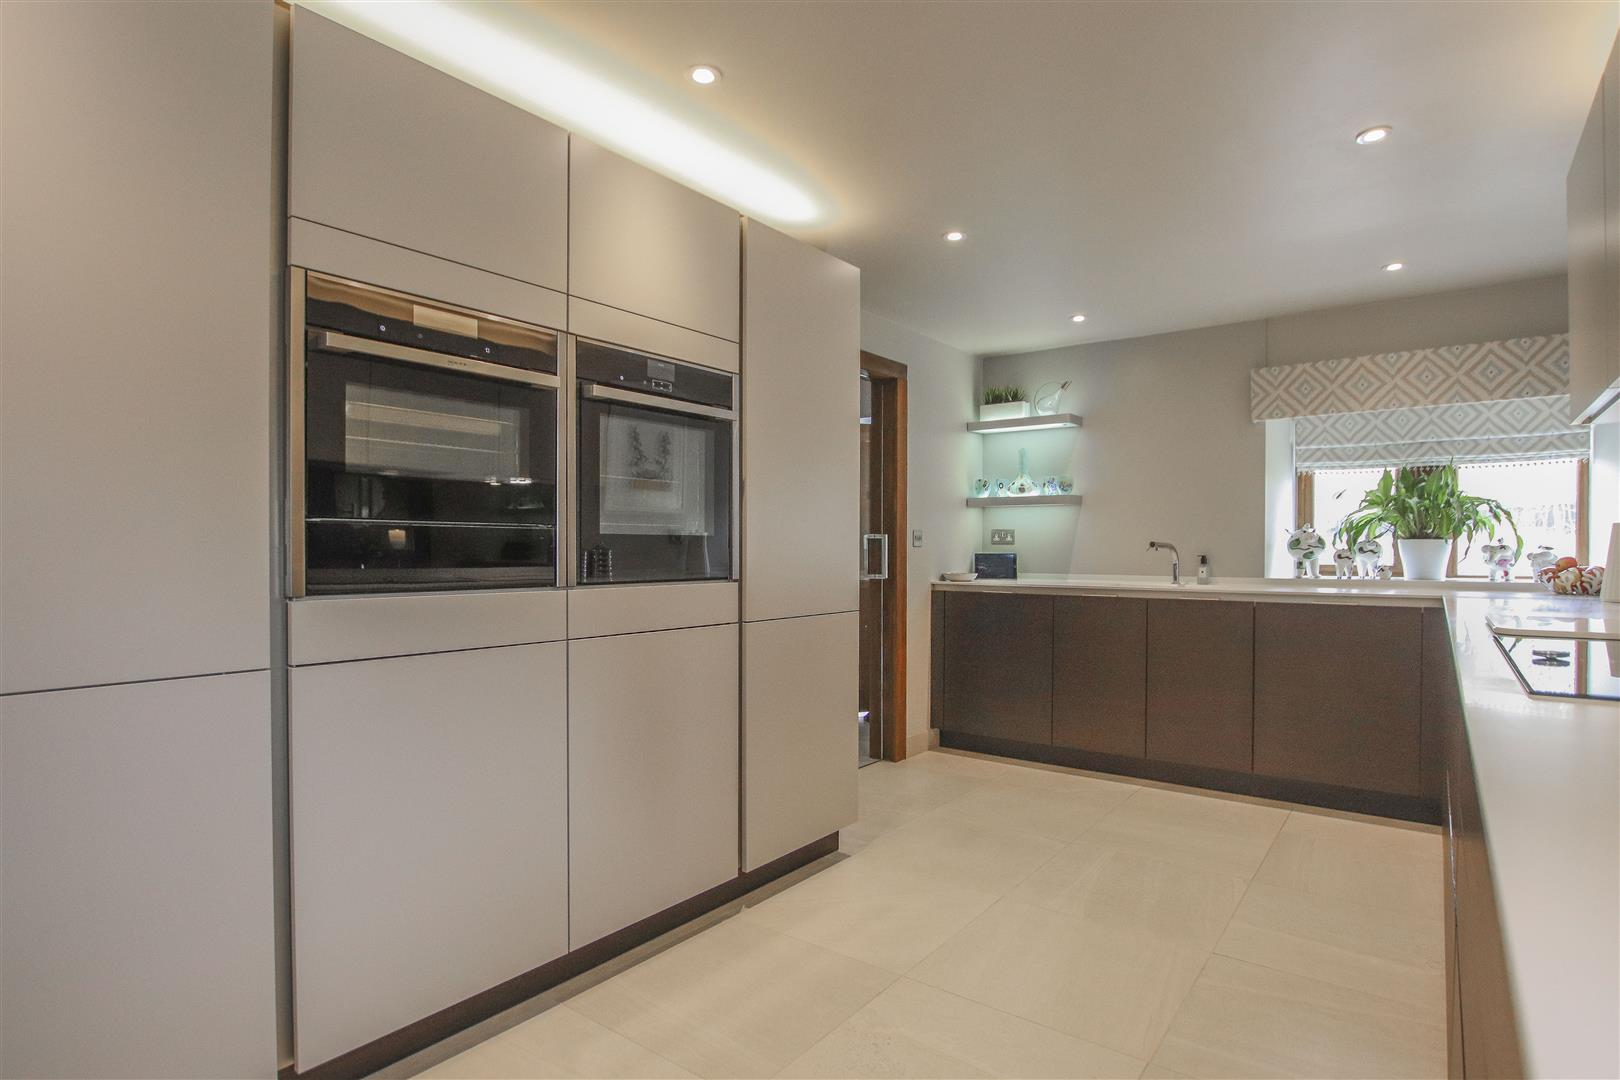 5 Bedroom Semi-detached House For Sale - 50.JPG